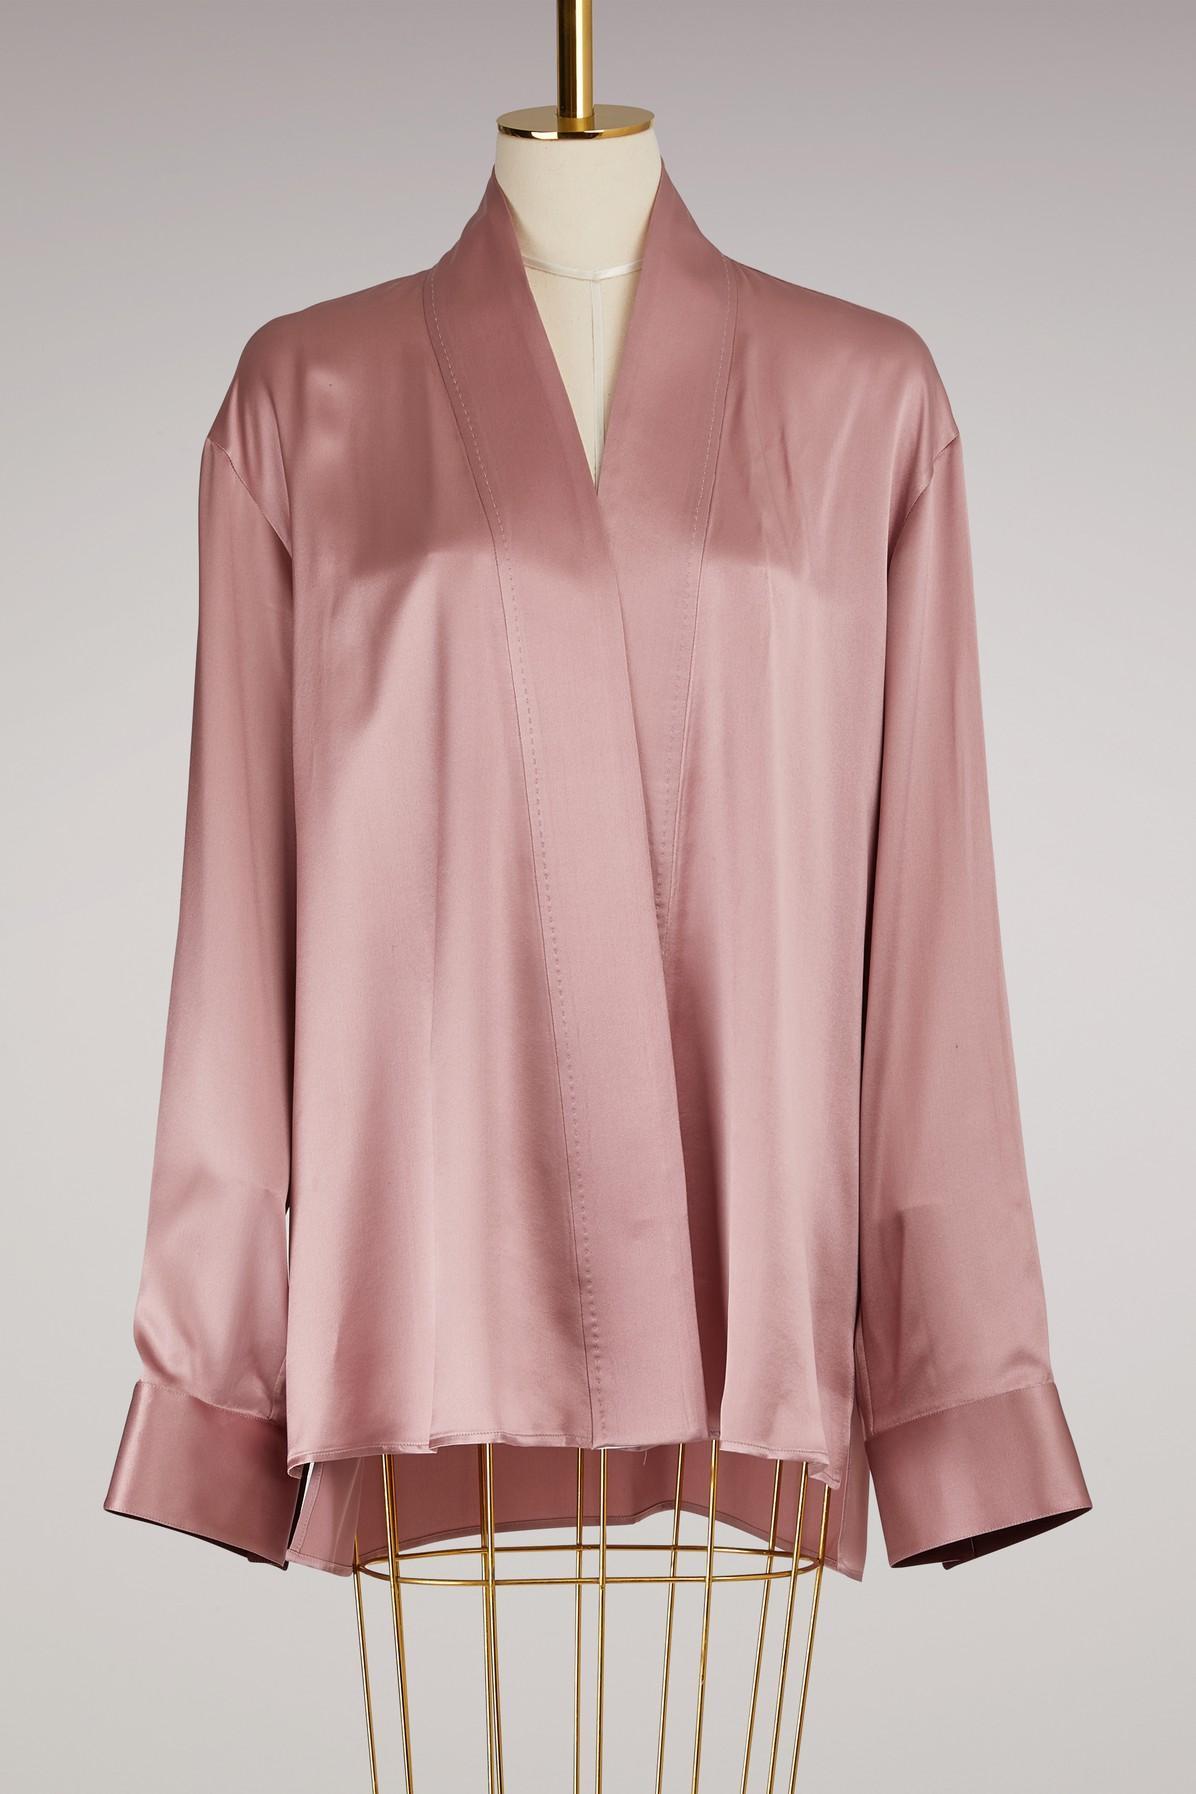 Haider Ackermann Silk Kimono Shirt In Rose/white/buthan